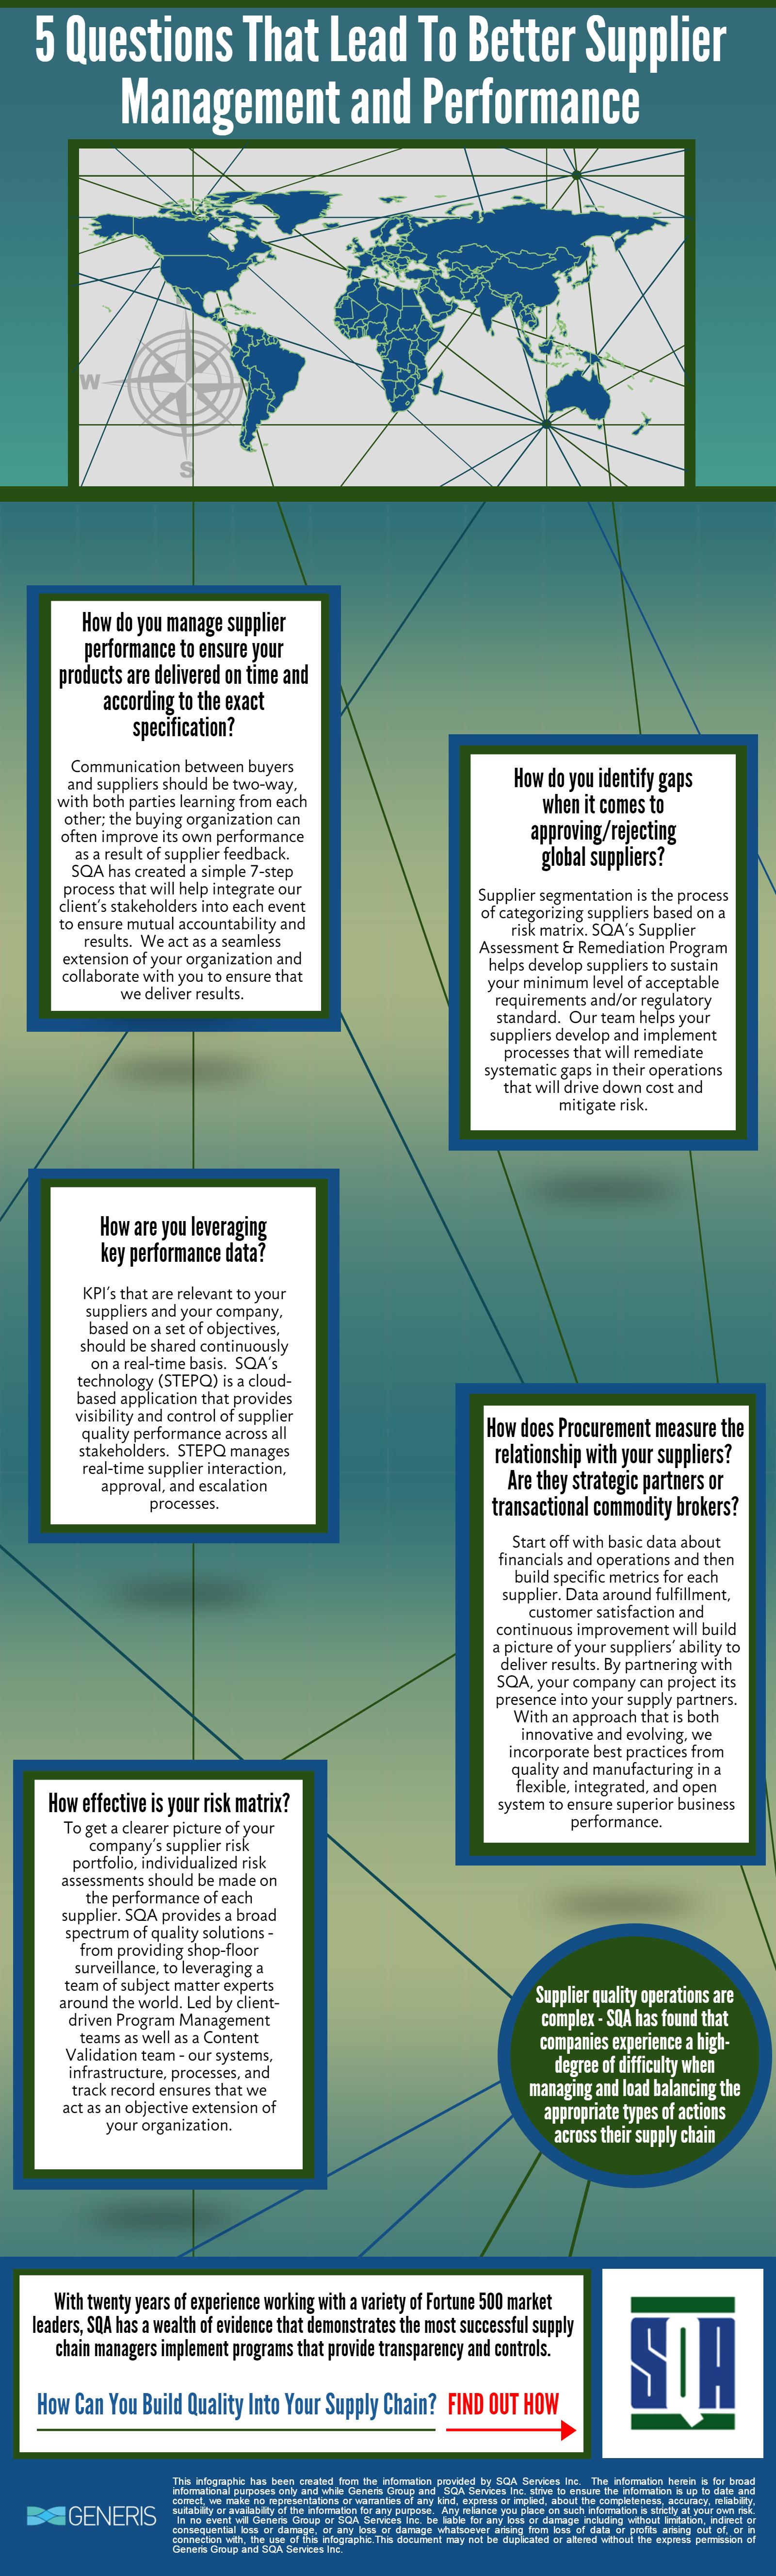 SQA Services- Supplier Performance Management (2)